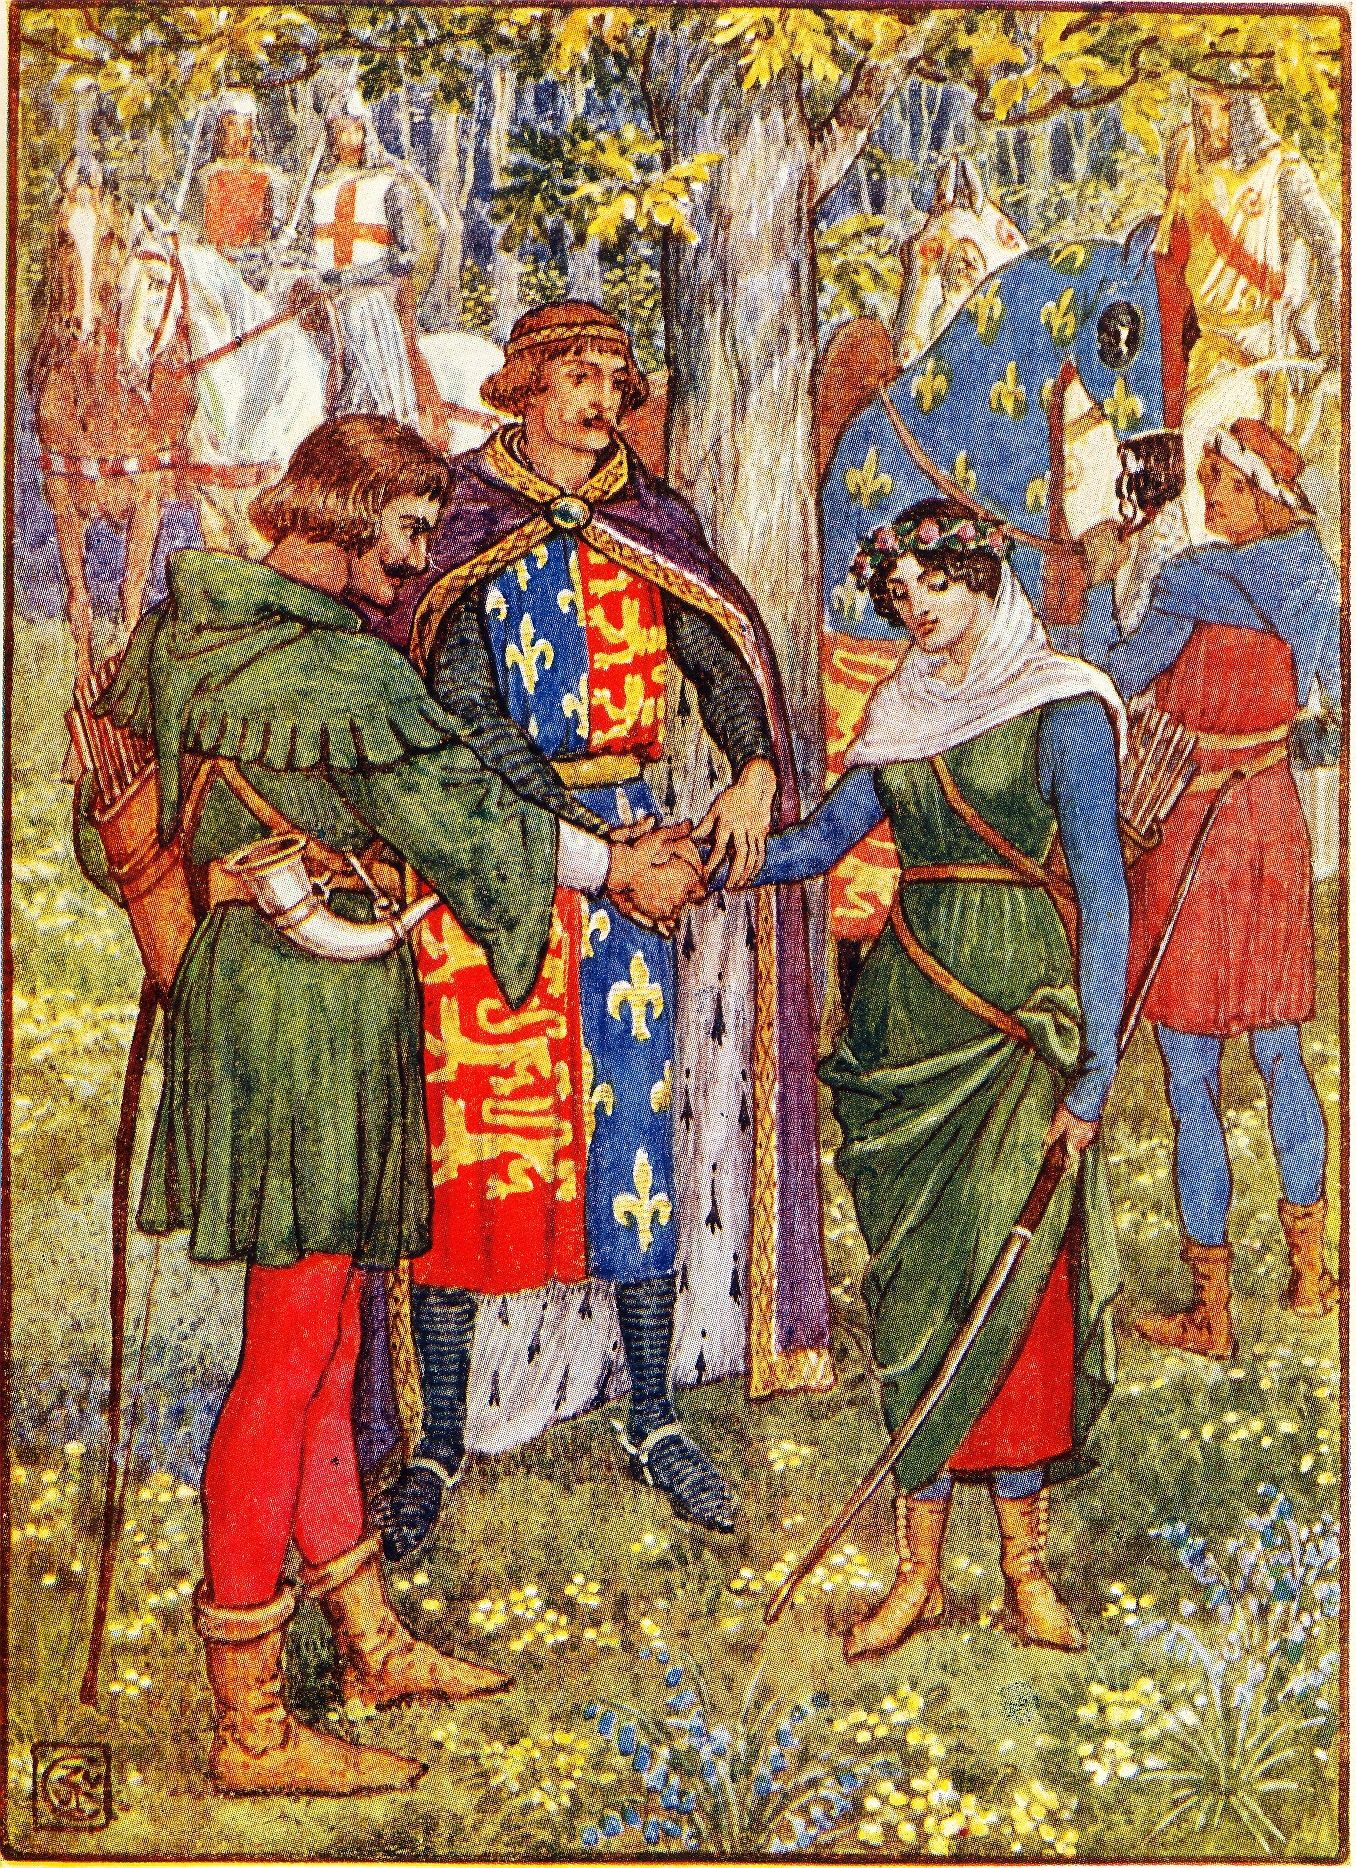 Robin Hood - Walter Crane Medieval And Pre-raphaelite